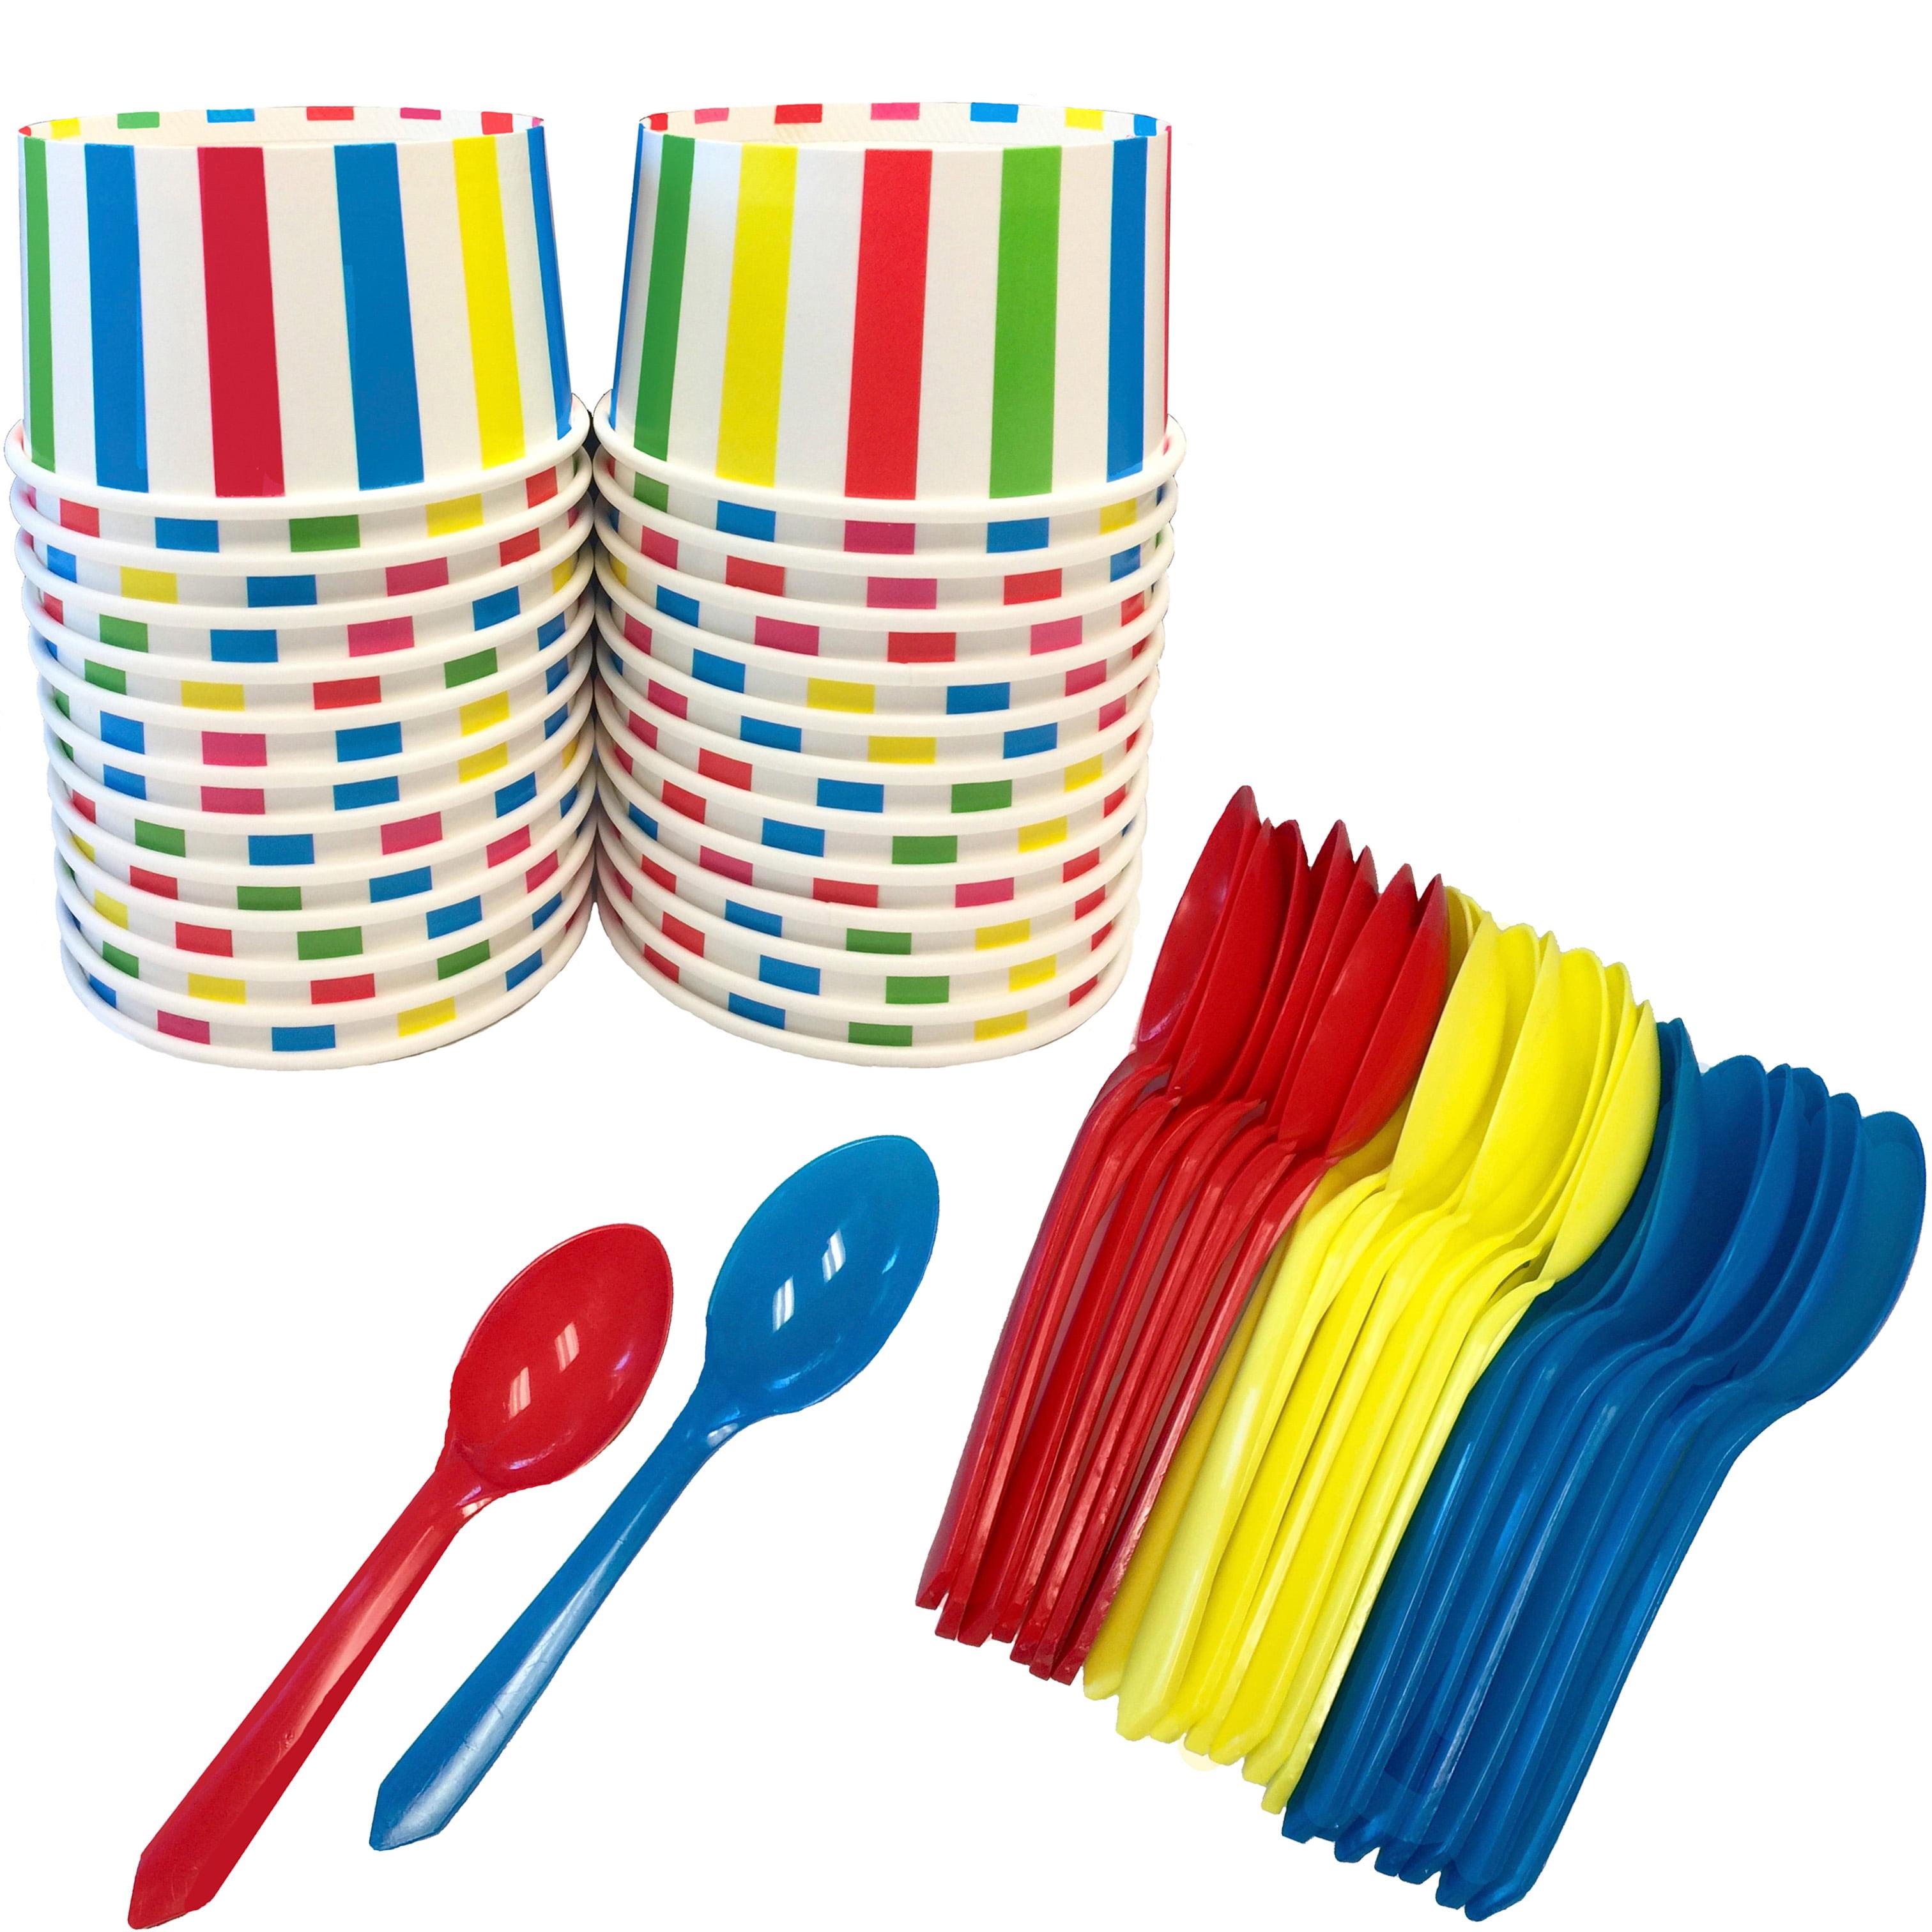 Circus or Lego Theme Striped Ice Cream Kit for 24